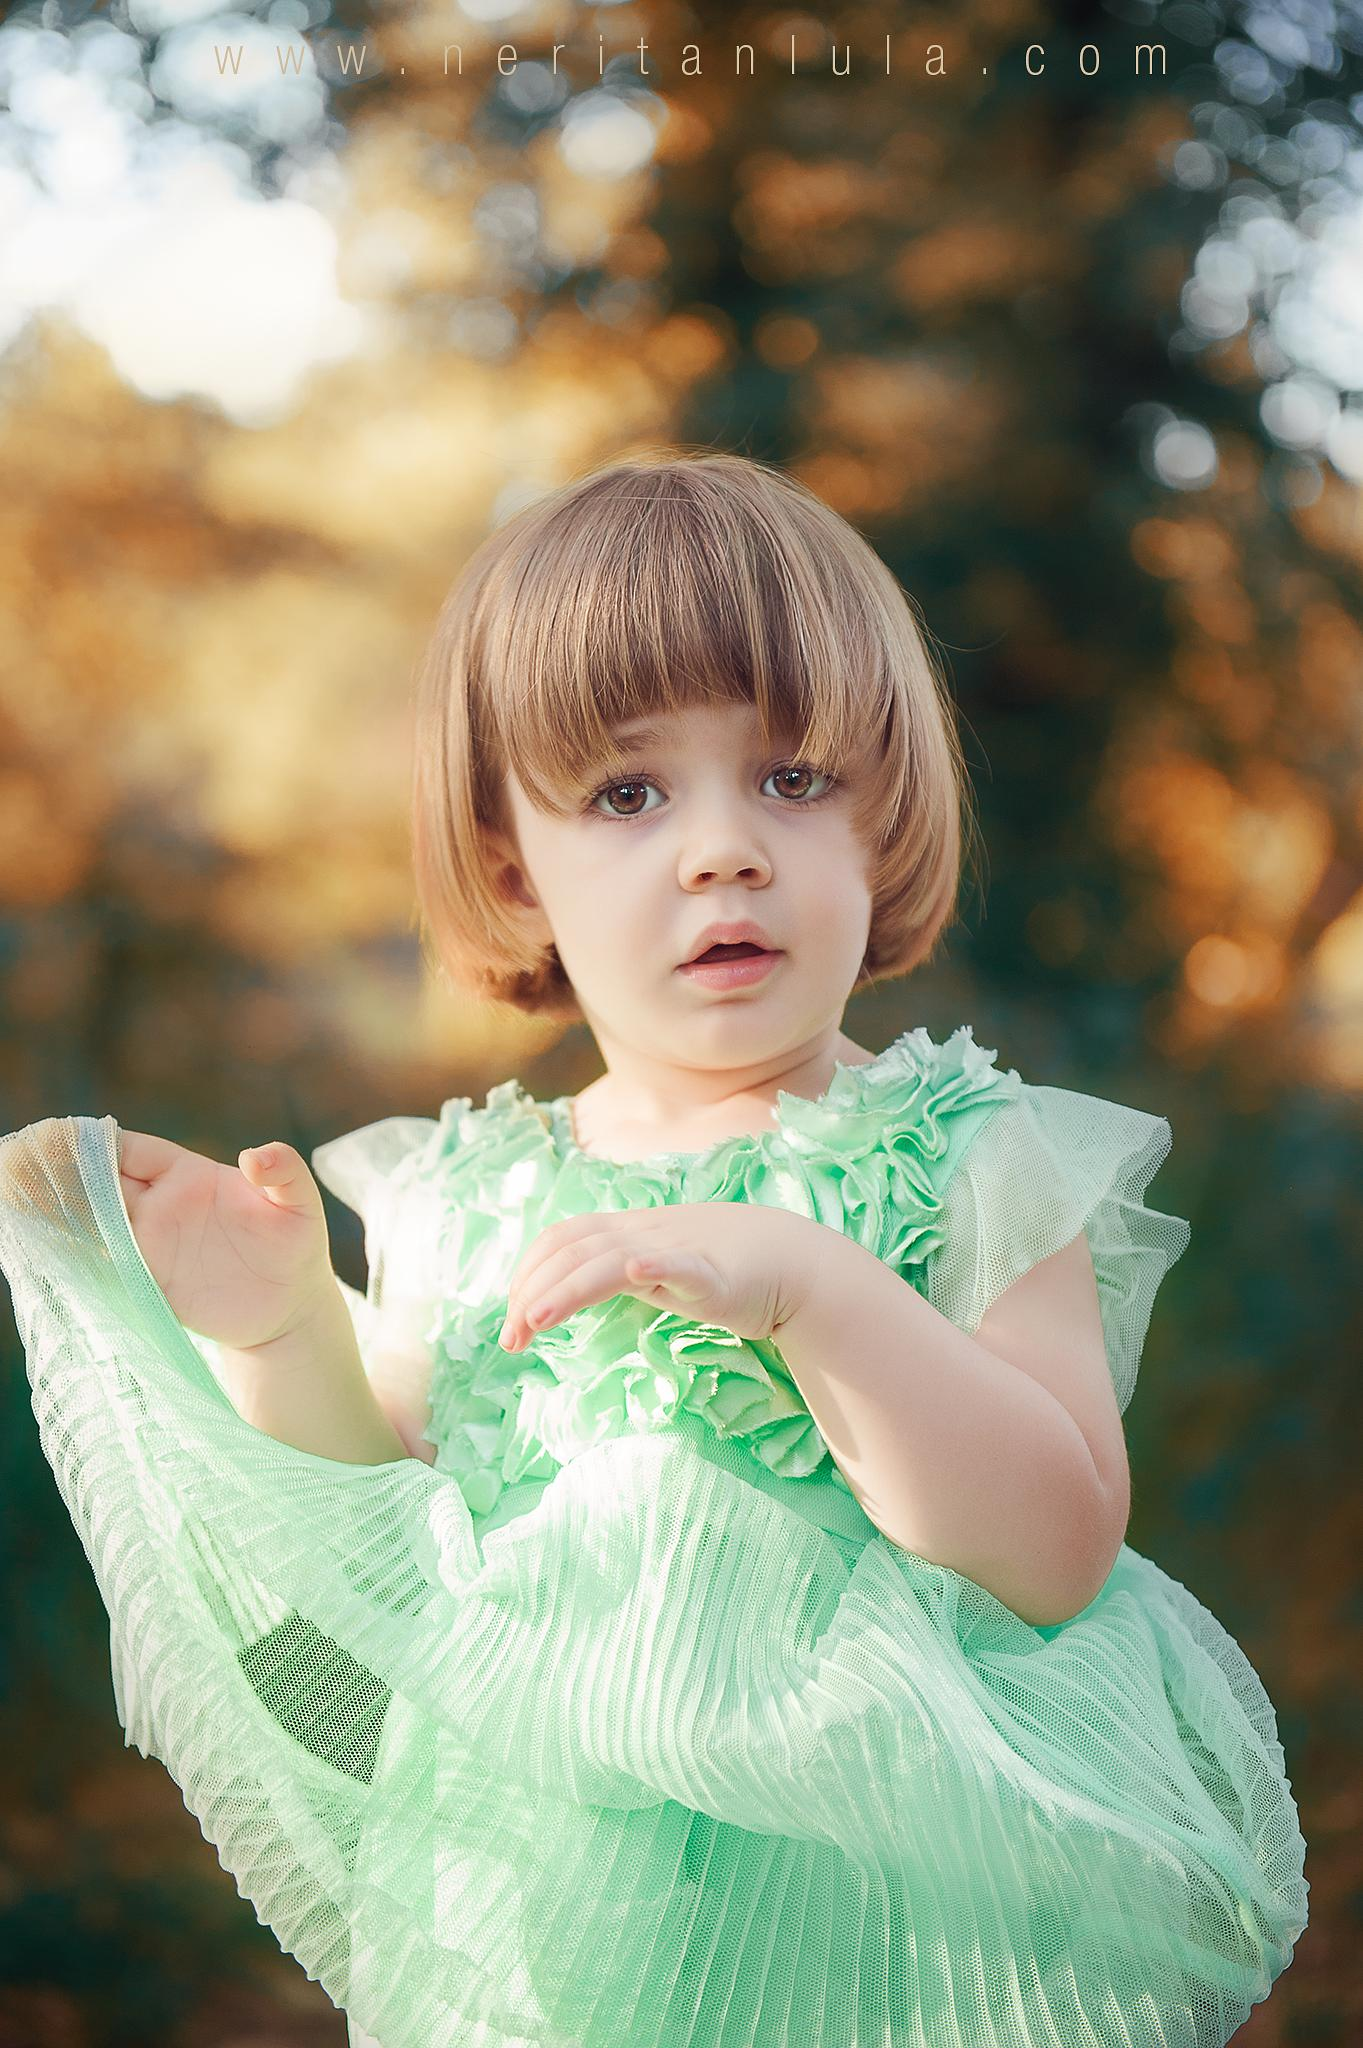 Little girl 2 by neritanlula